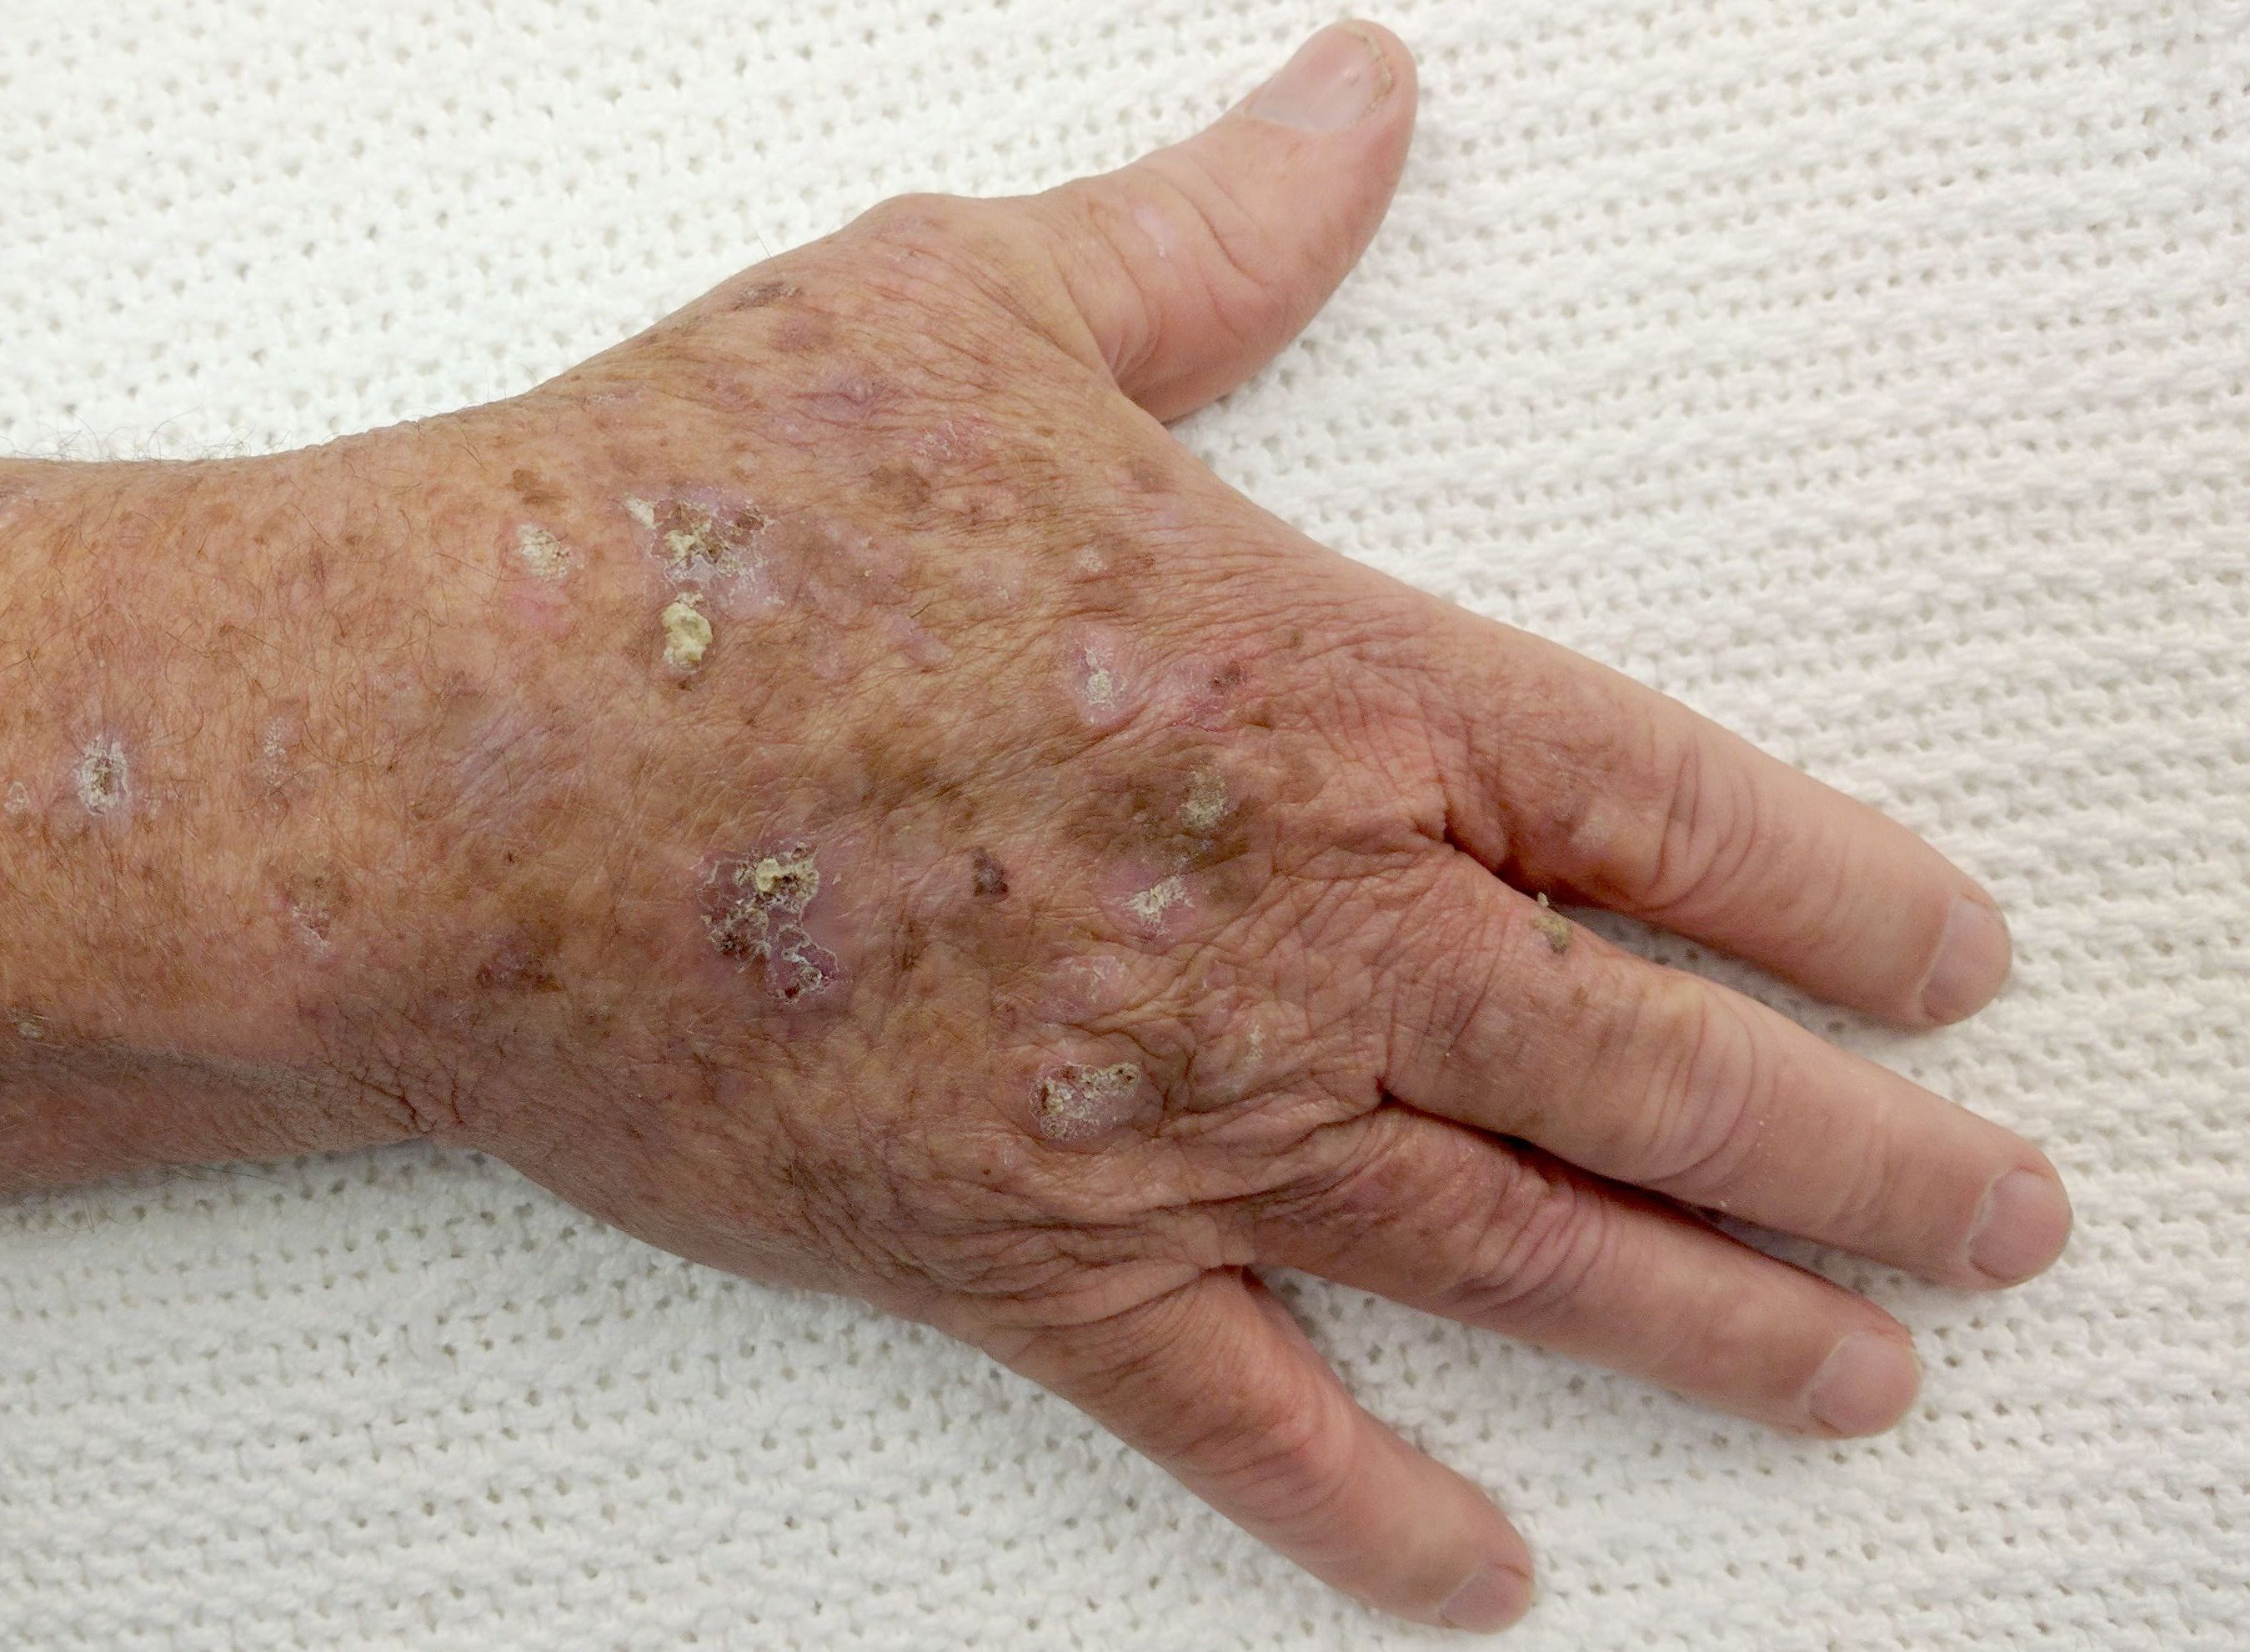 Aktinische Keratose Aussehen Online Diagnose Behandlung